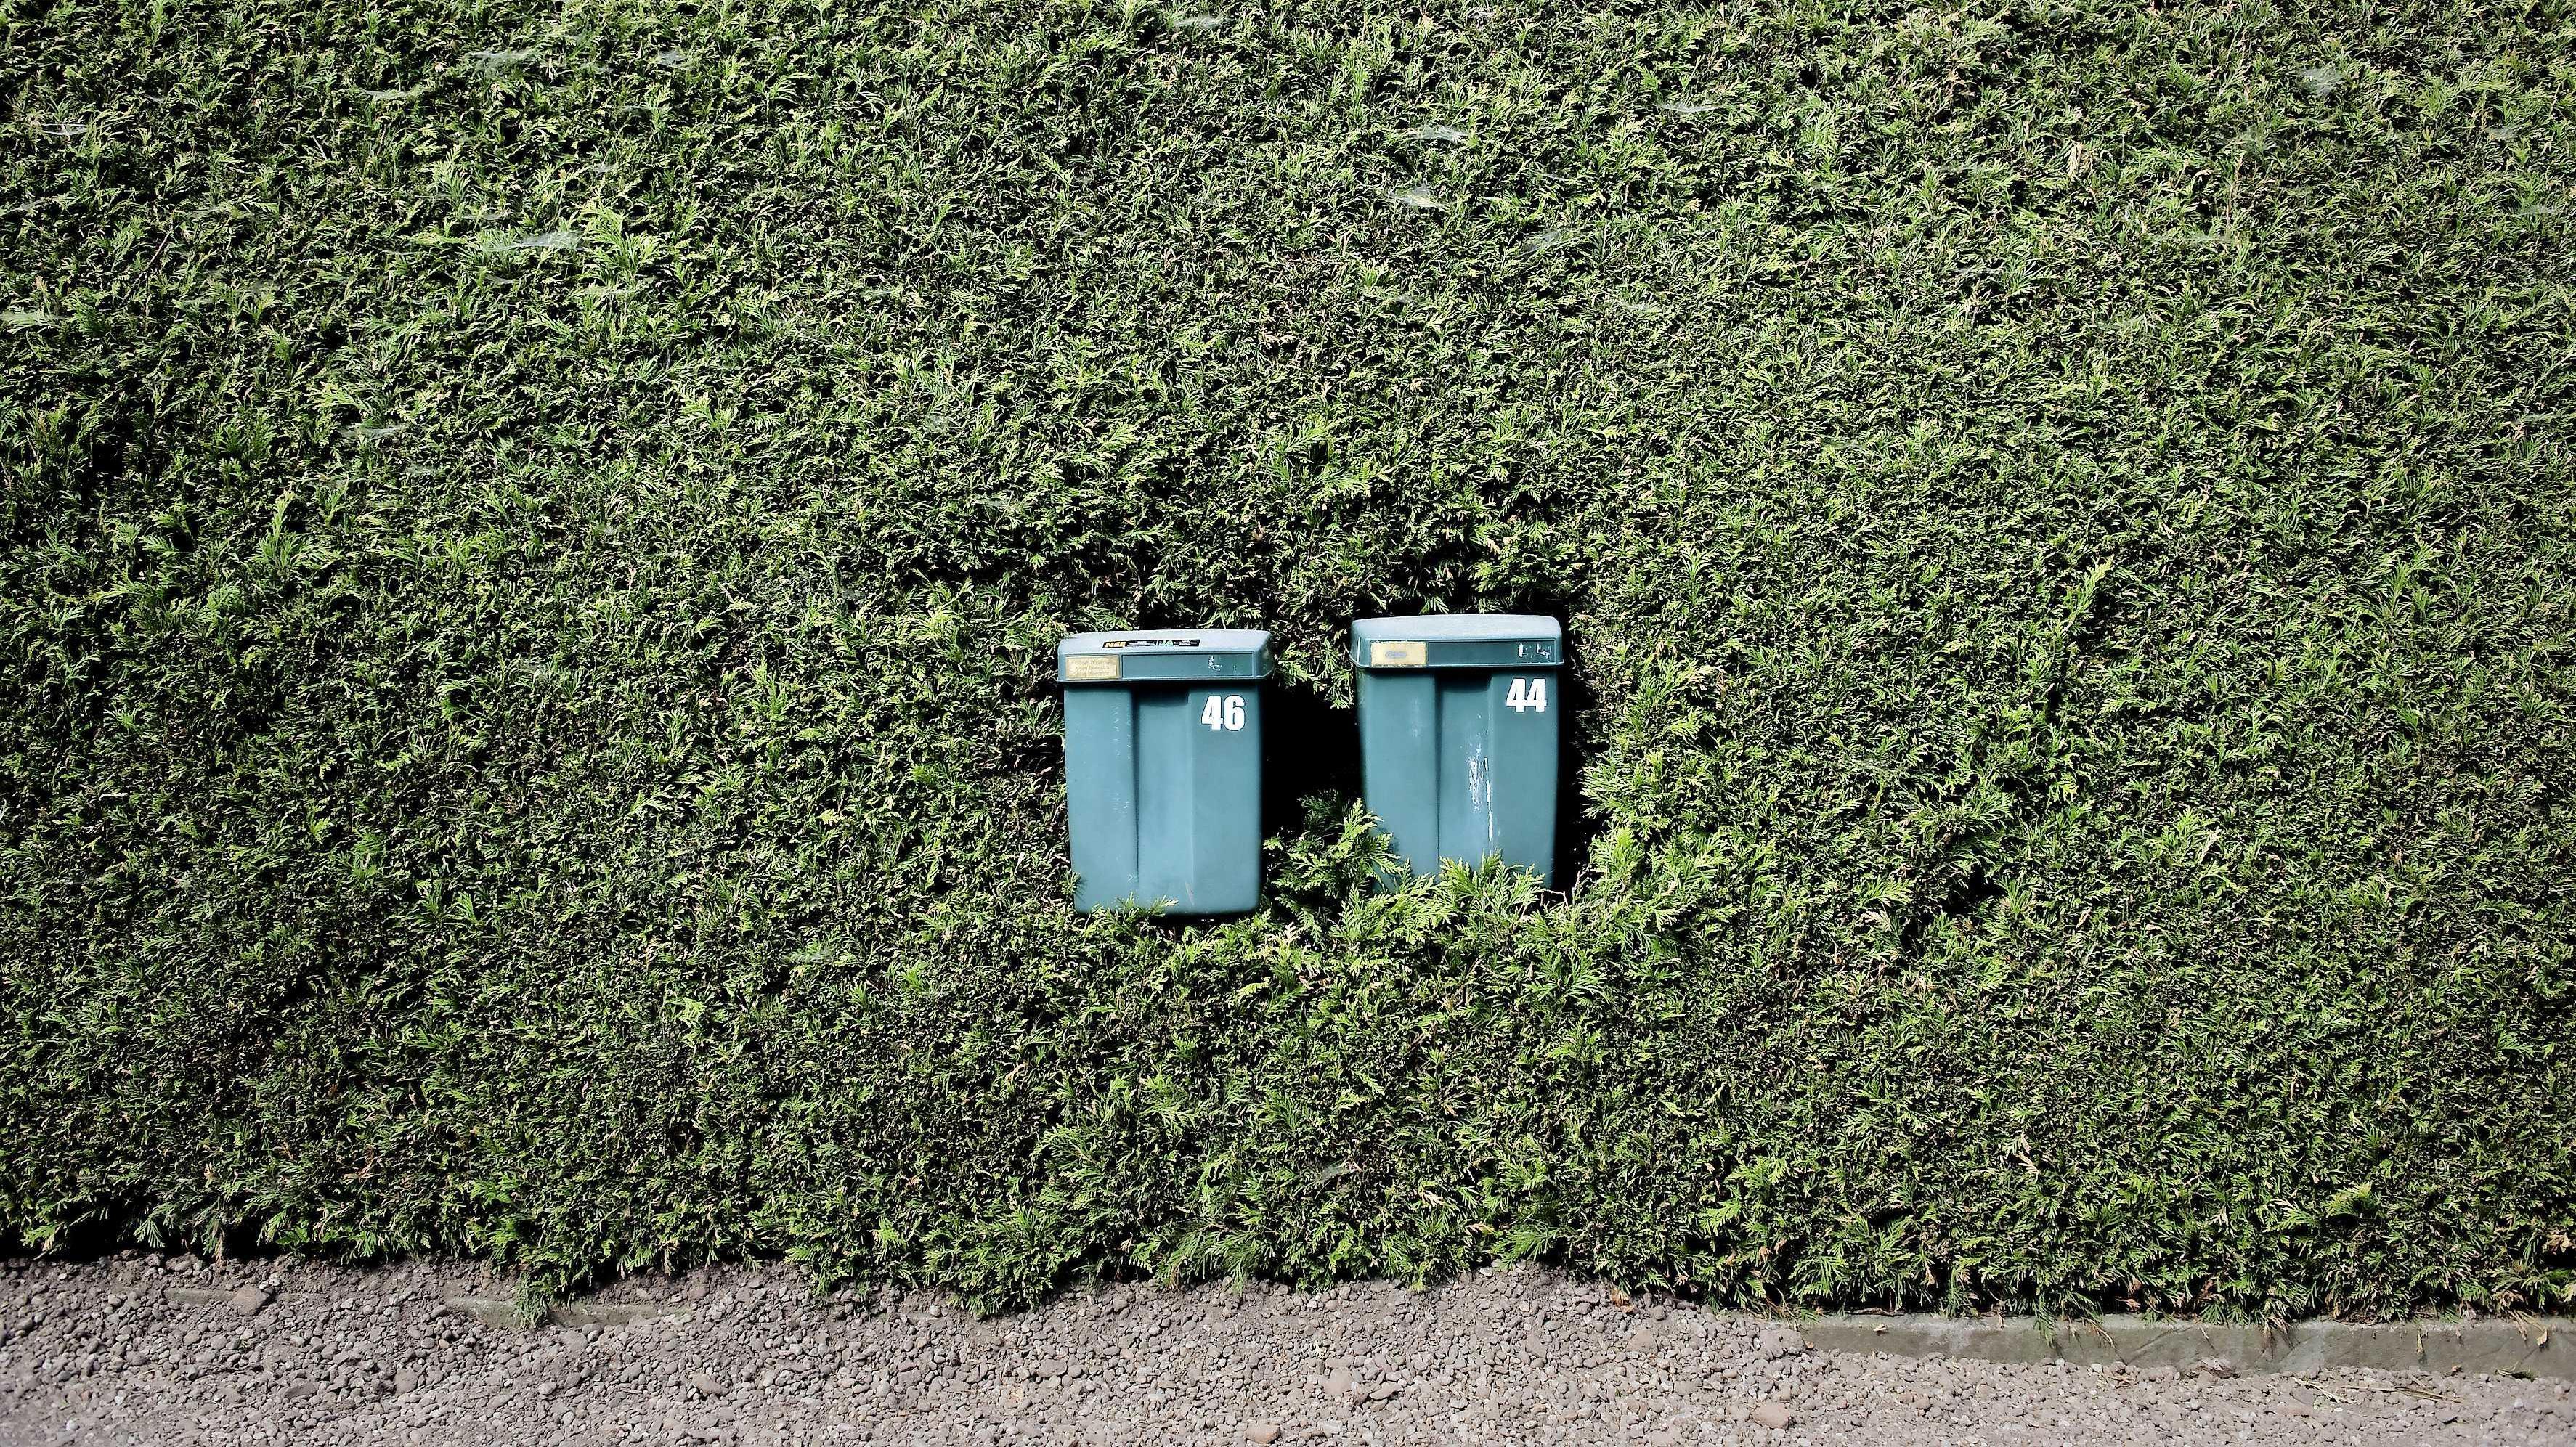 Bekend Ontwerper groene brievenbus overleden | Binnenland | Telegraaf.nl TX35